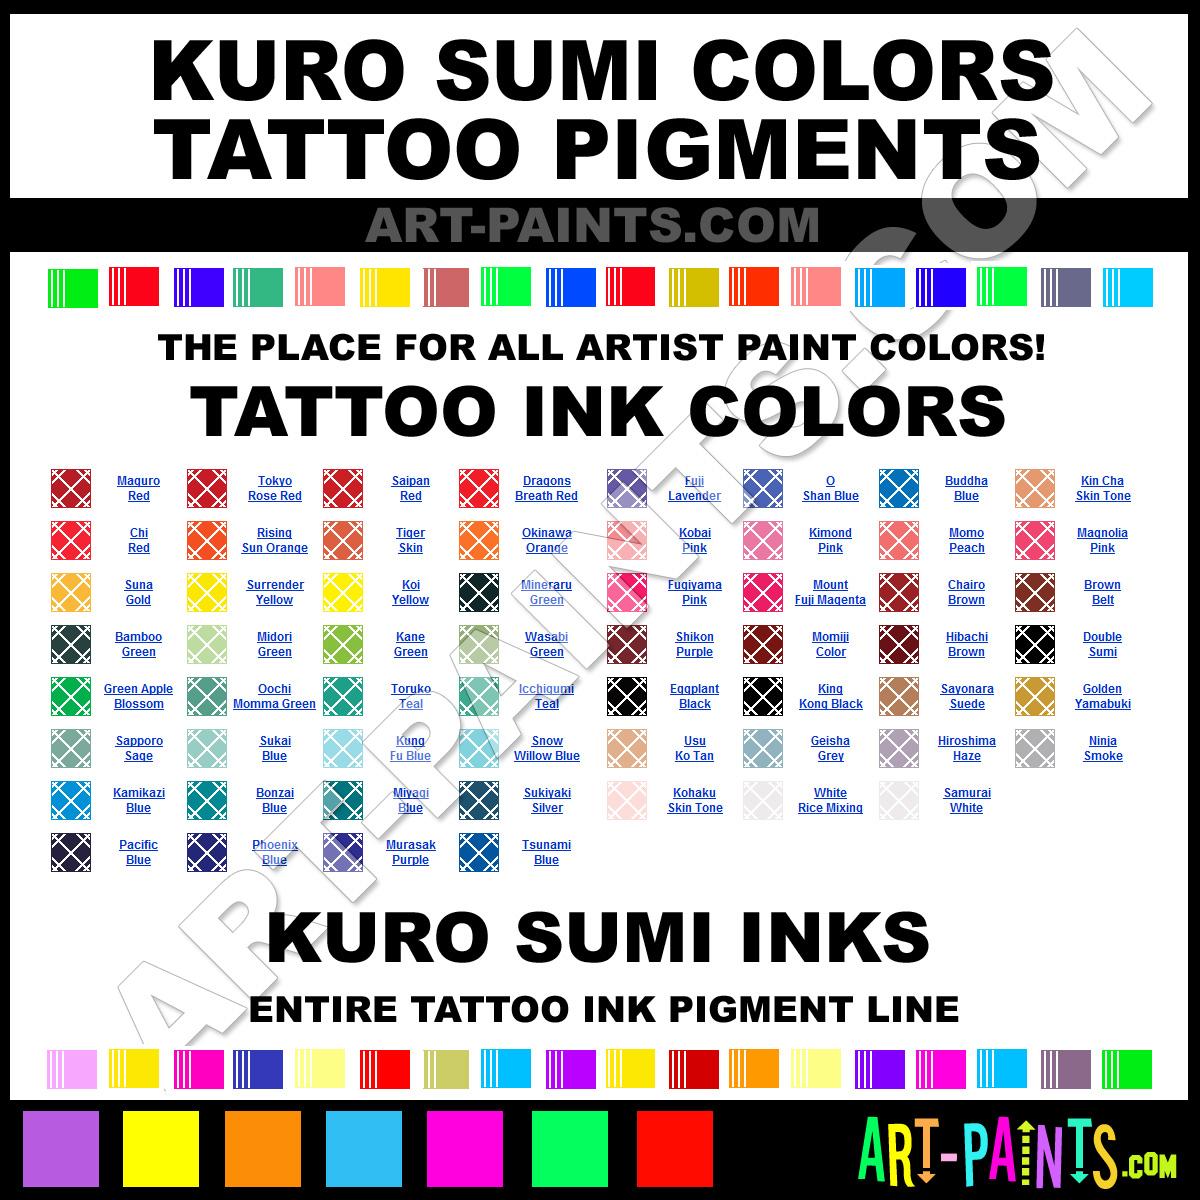 Kuro Sumi Colors Tattoo Ink Pigment Paint Colors Kuro